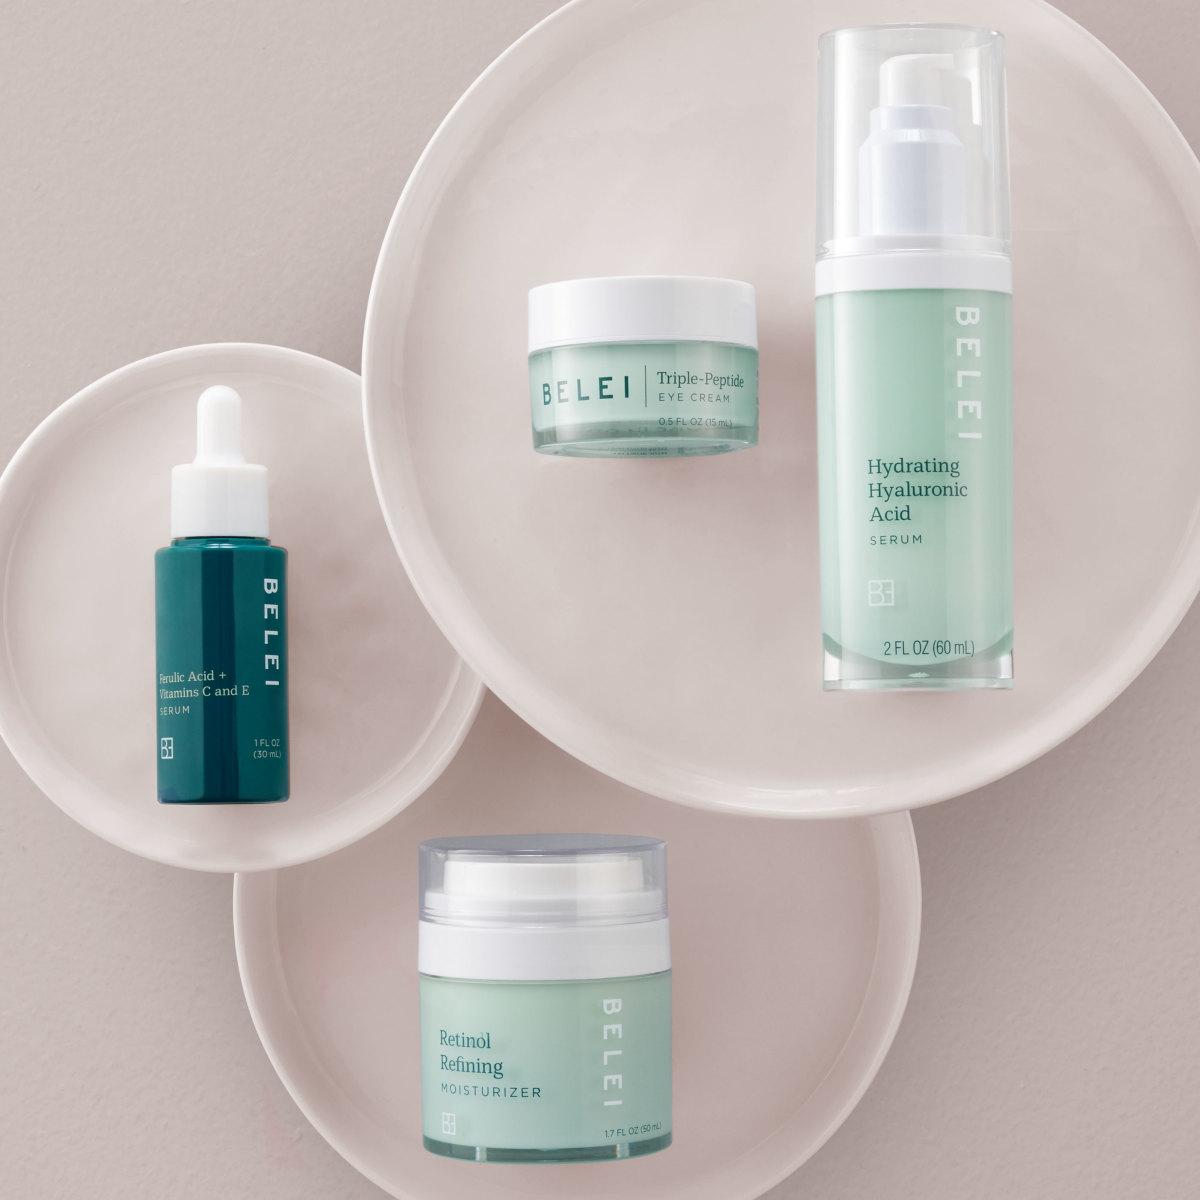 Products from Amazon's new Belei skin-care range. Photo: Courtesy of Amazon